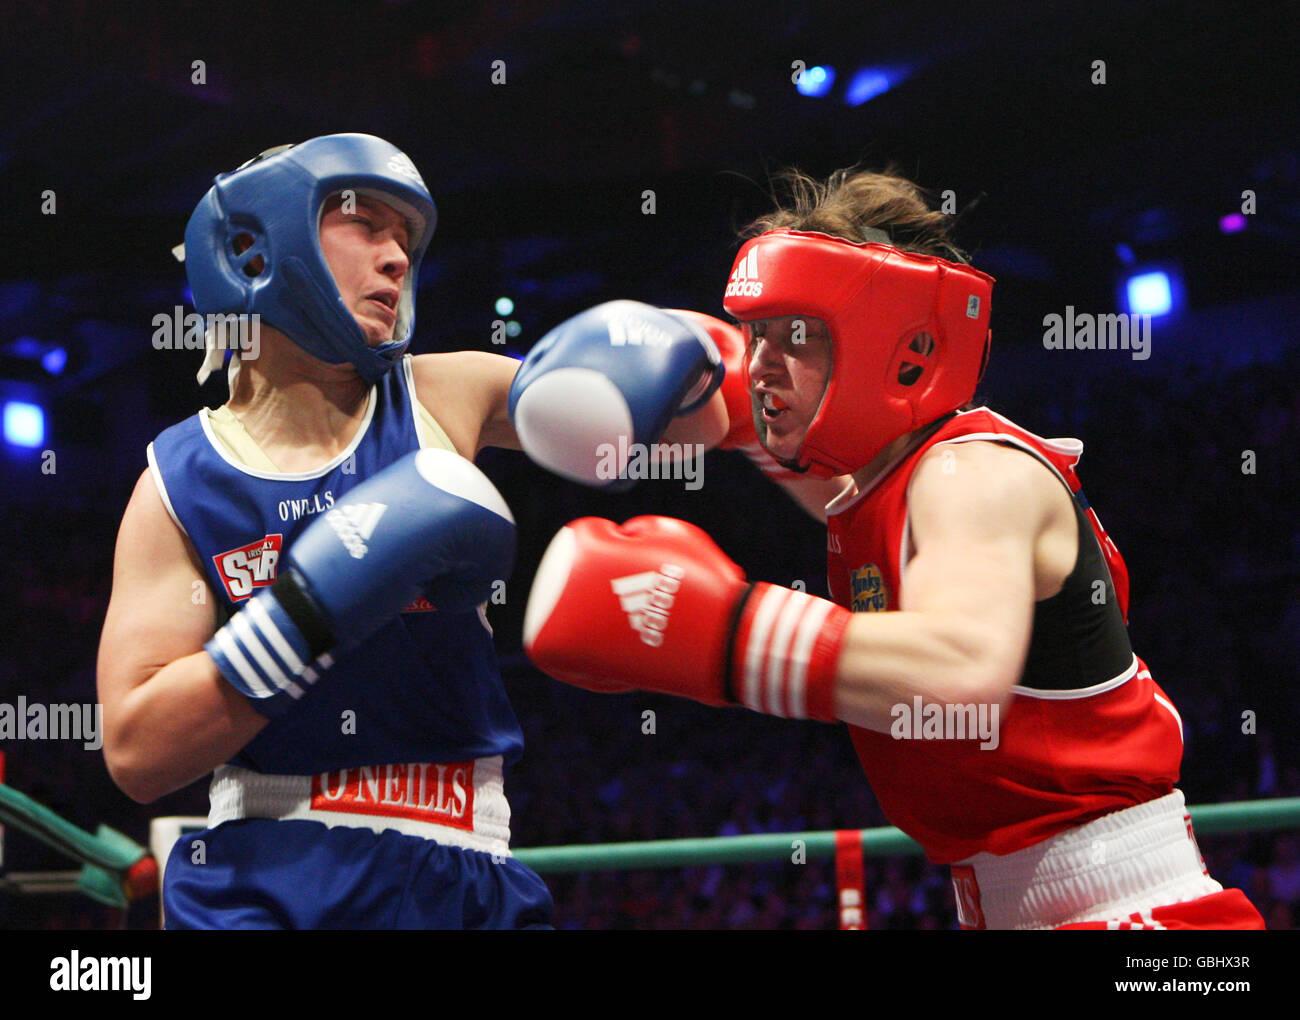 Lightweight amateur boxers